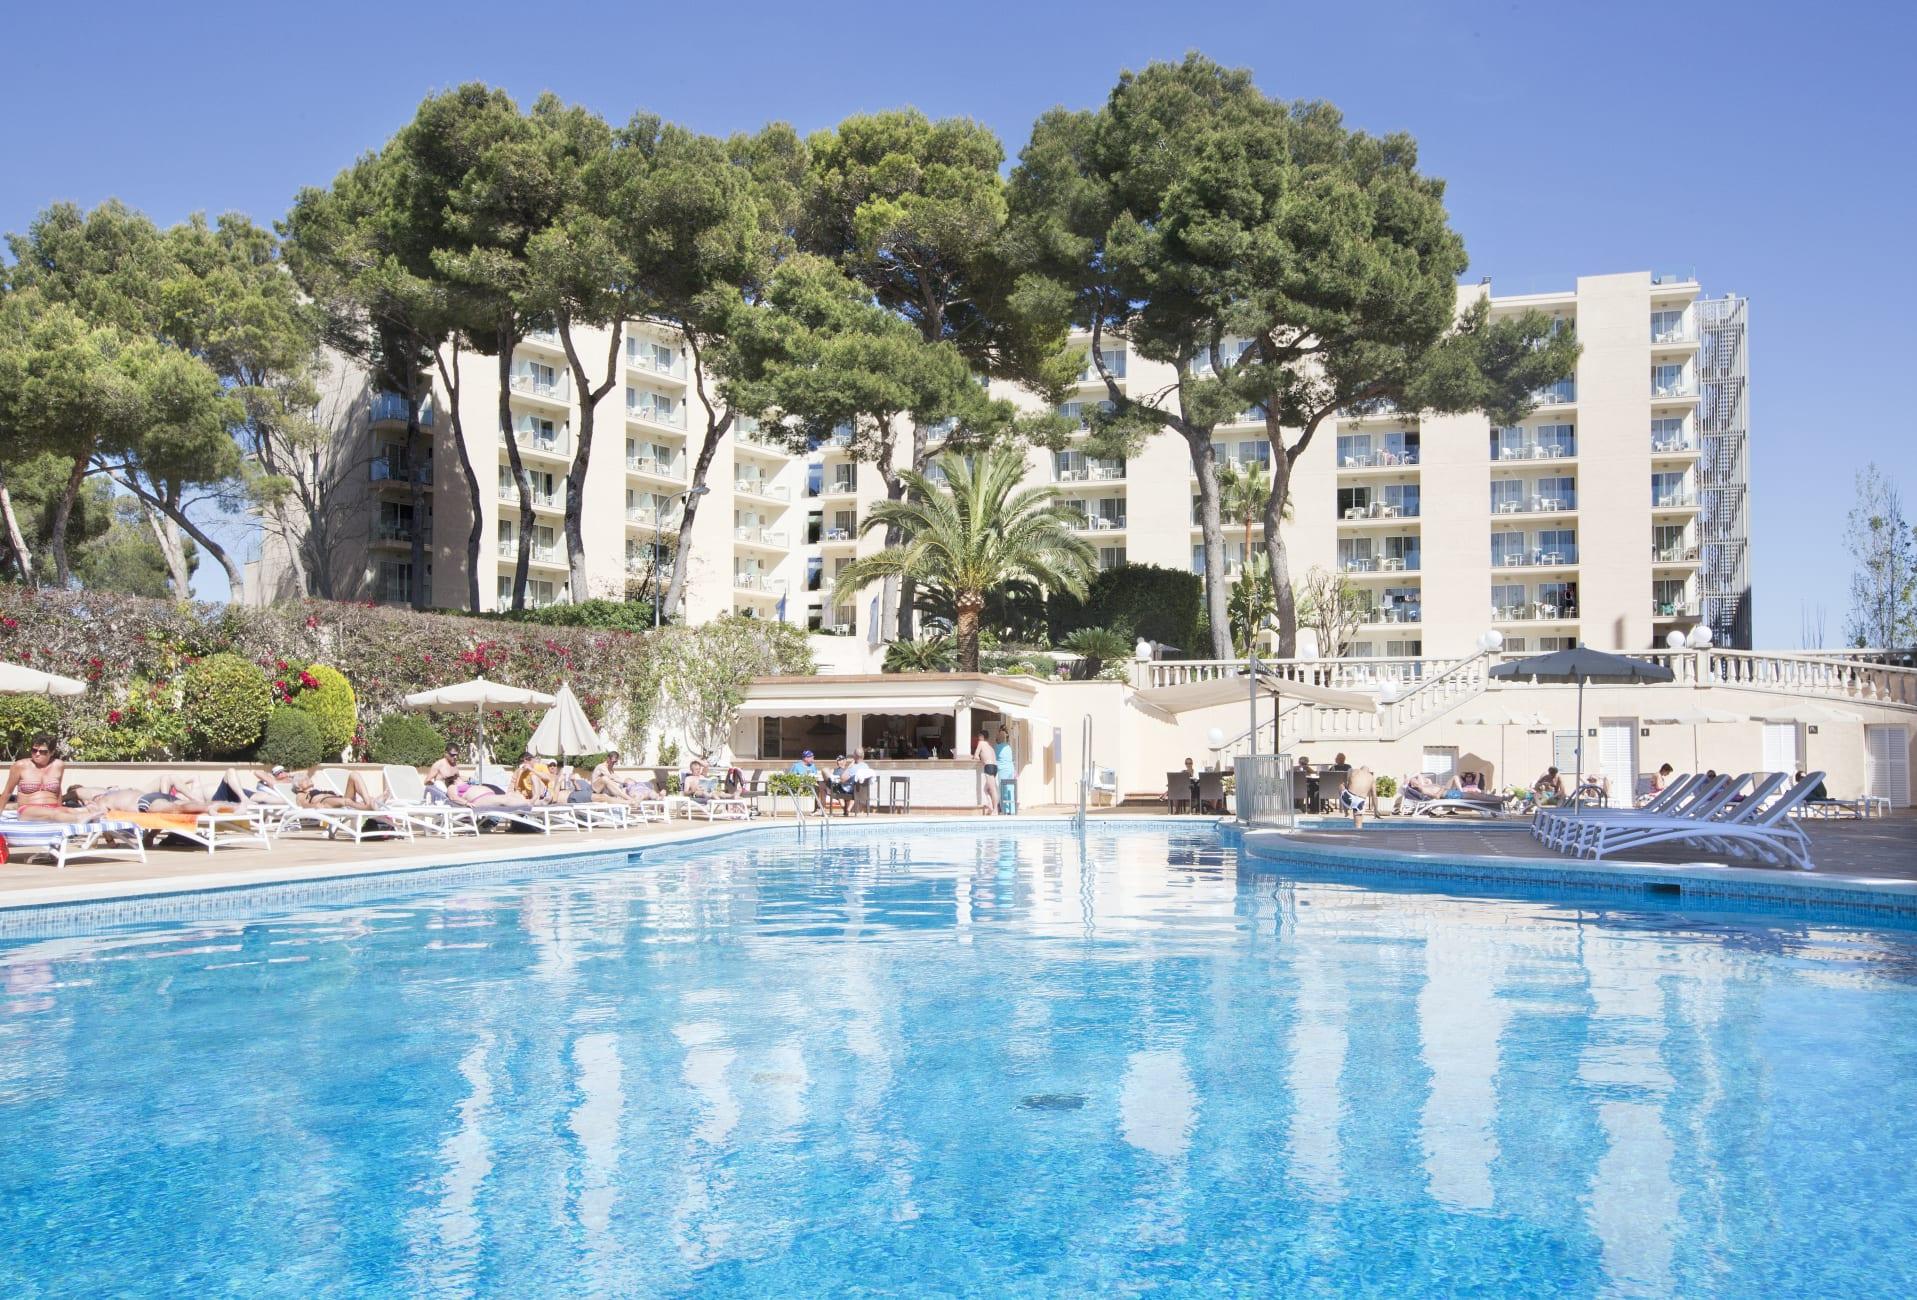 Hotel Hotel Grupotel Orient Playa De Palma Trivago De